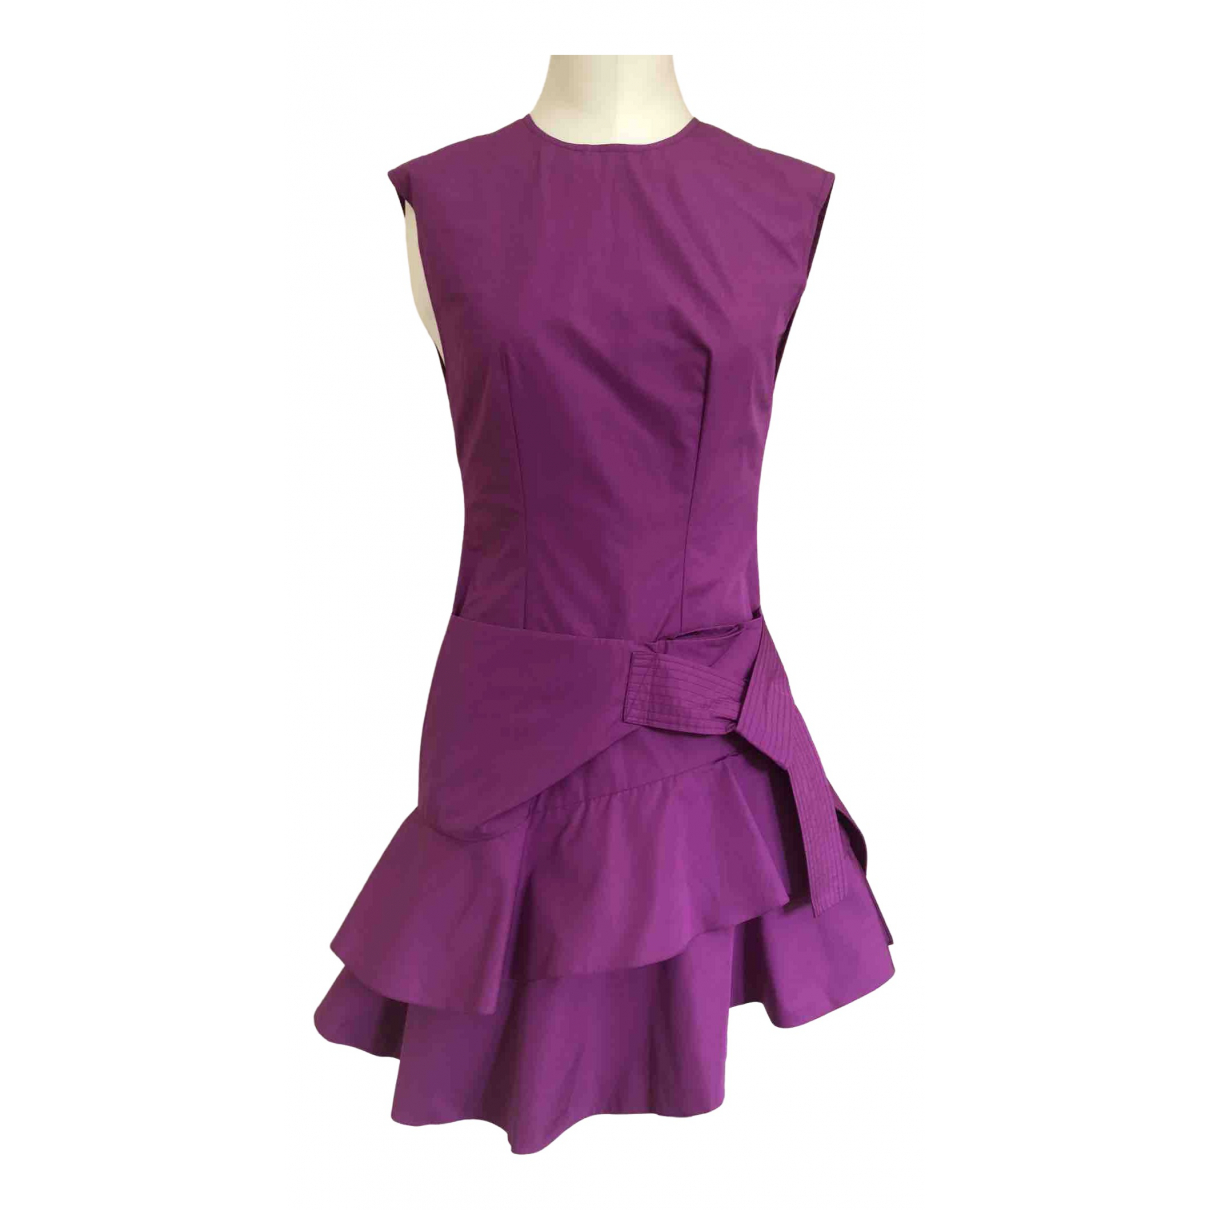 Louis Vuitton \N Kleid in  Lila Baumwolle